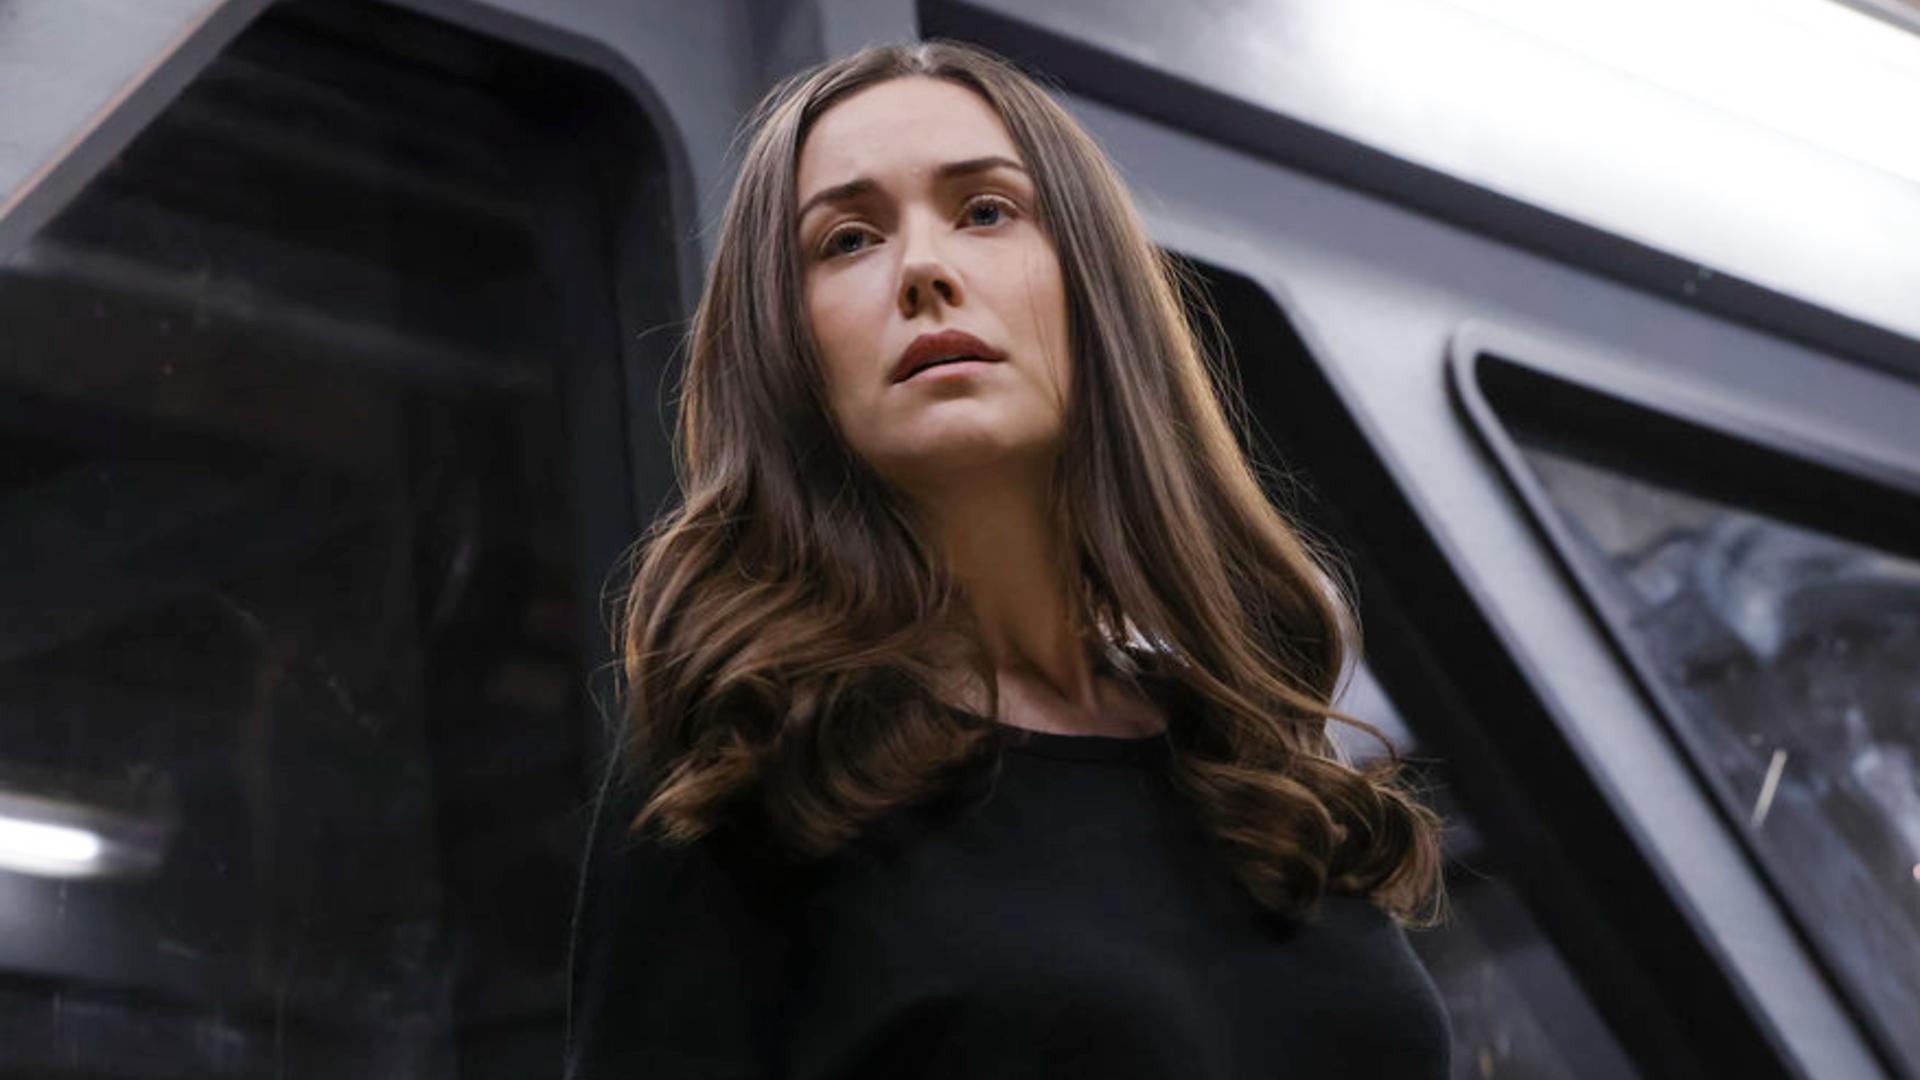 The Blacklist Season 8 Episode 20 'Godwin Page' Elizabeth Liz Keen Megan Boone NBC